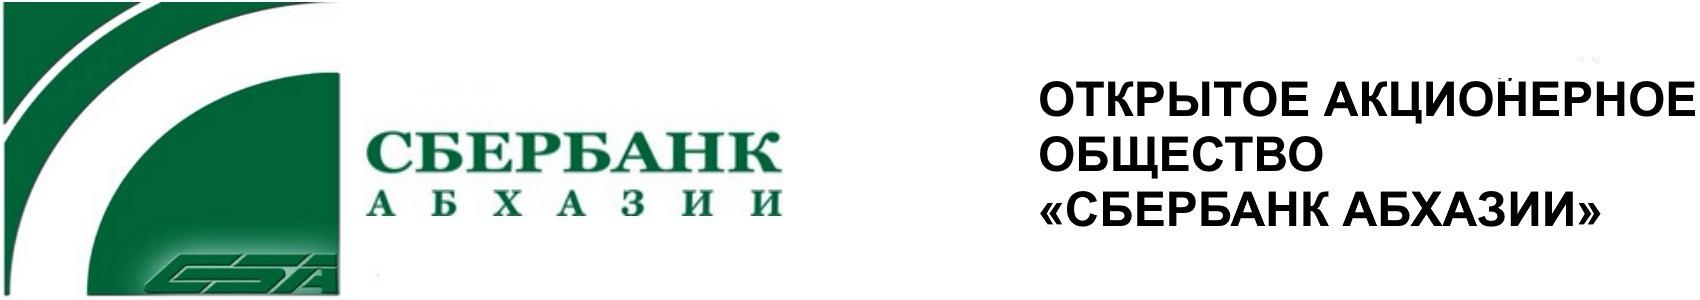 сбербанк Абхазии; микрозаймы онлайн